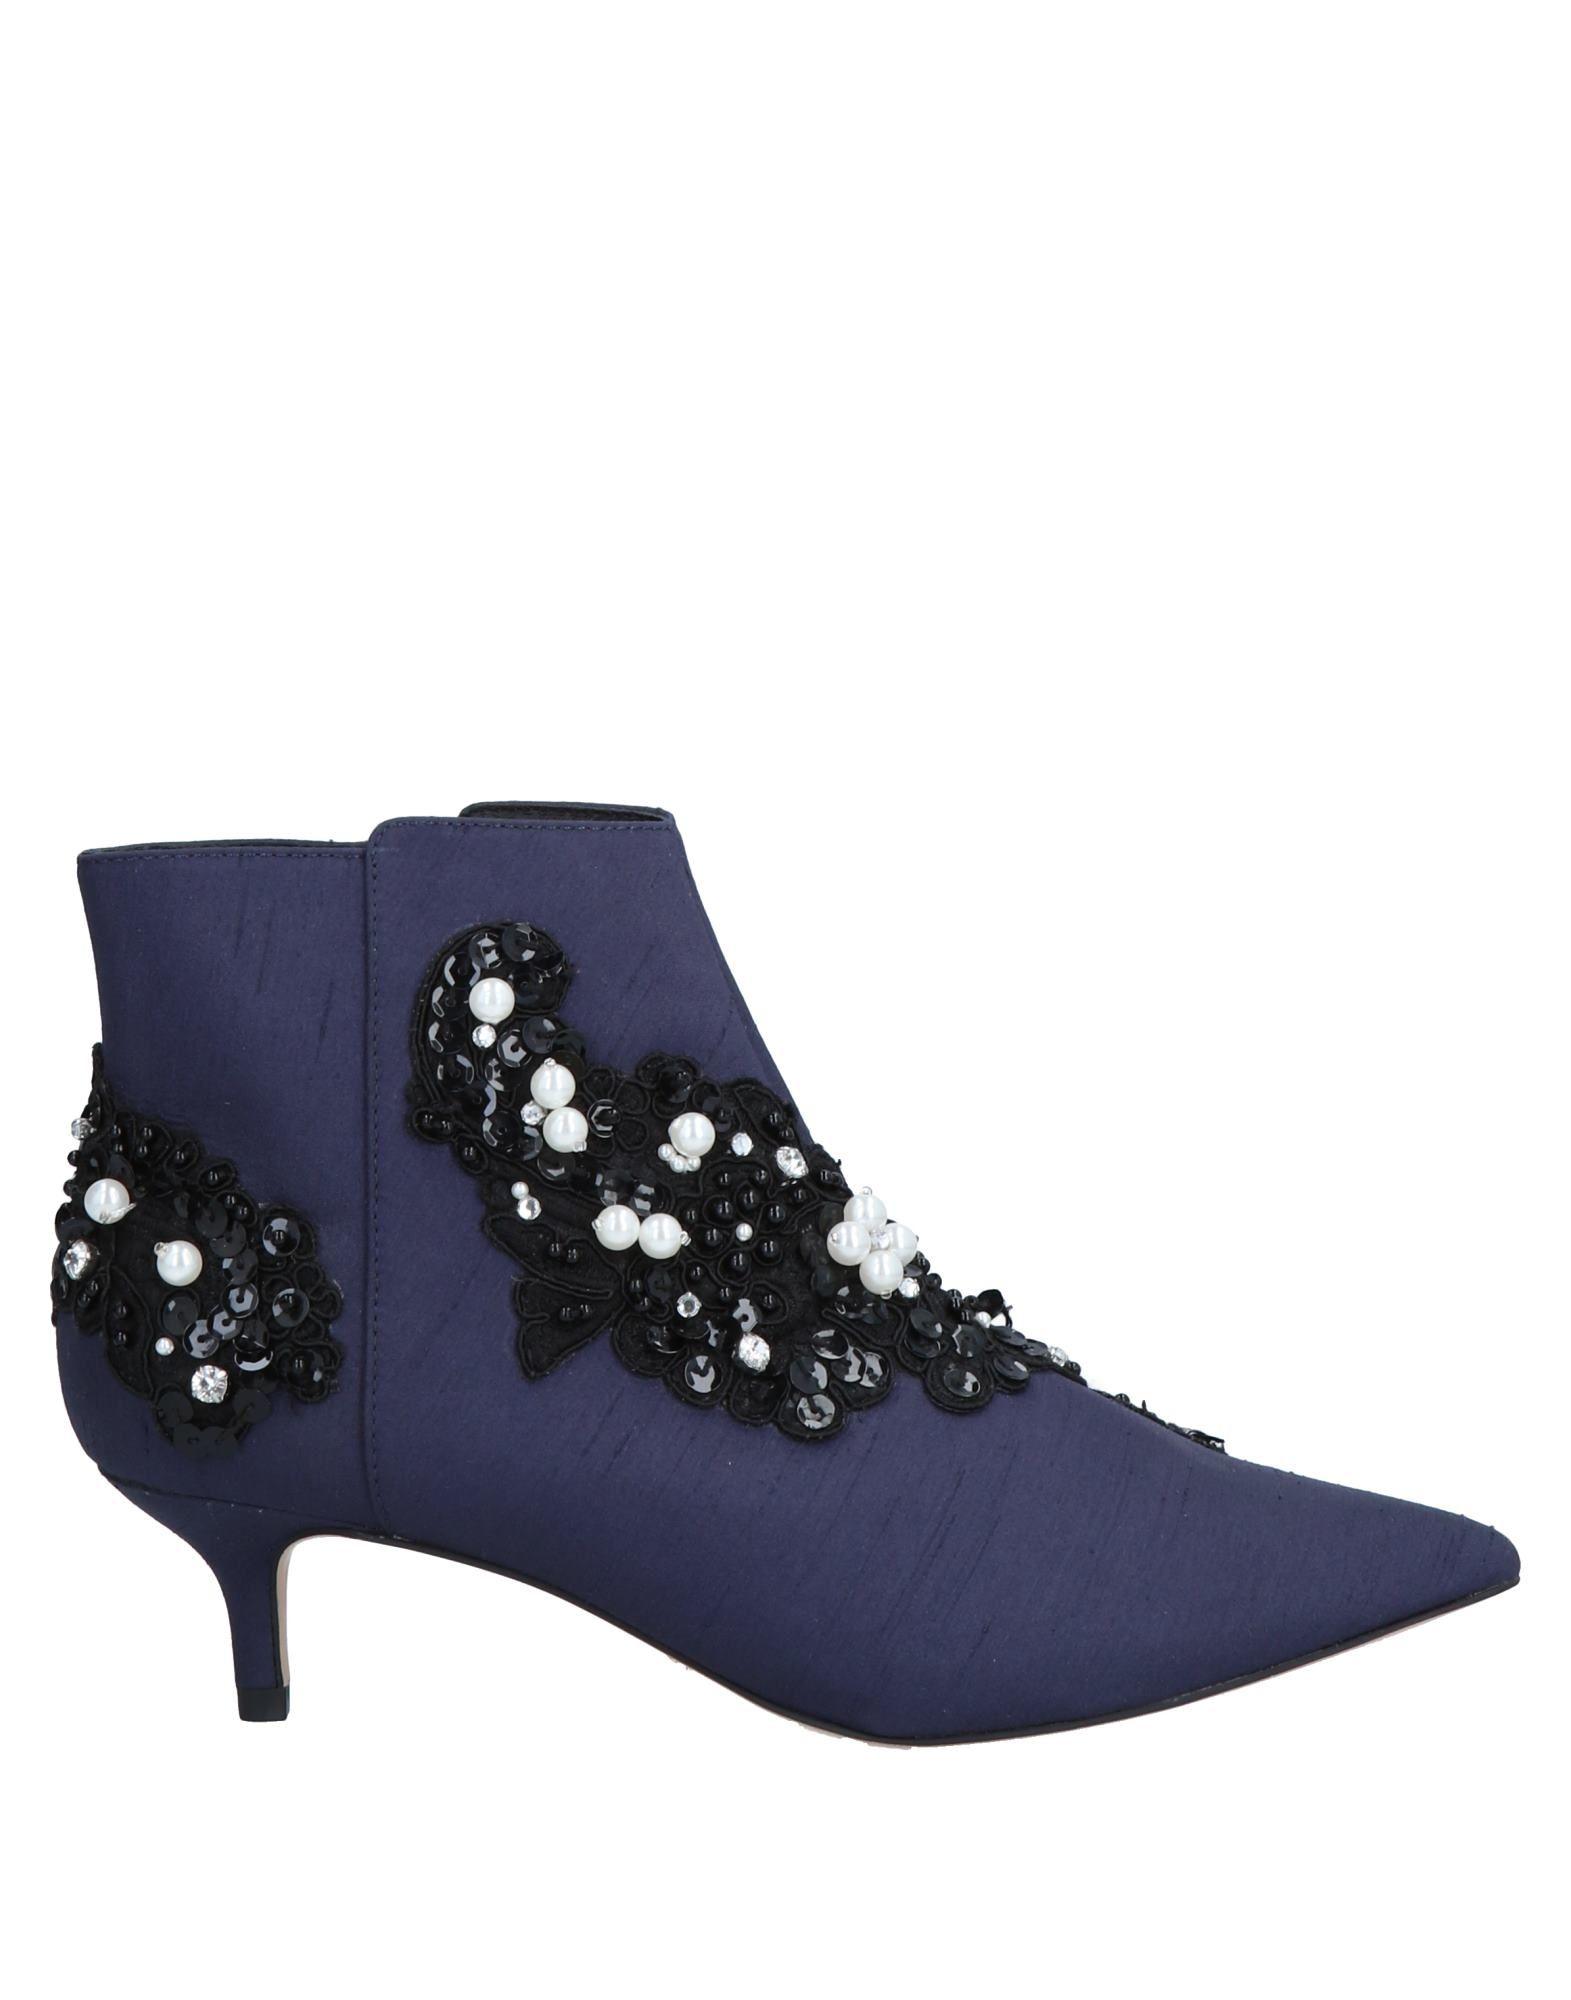 Kg Kurt Geiger Ankle Boot - Women Kg Kurt Geiger Ankle Ankle Geiger Boots online on  Australia - 11584442KA dc3f36